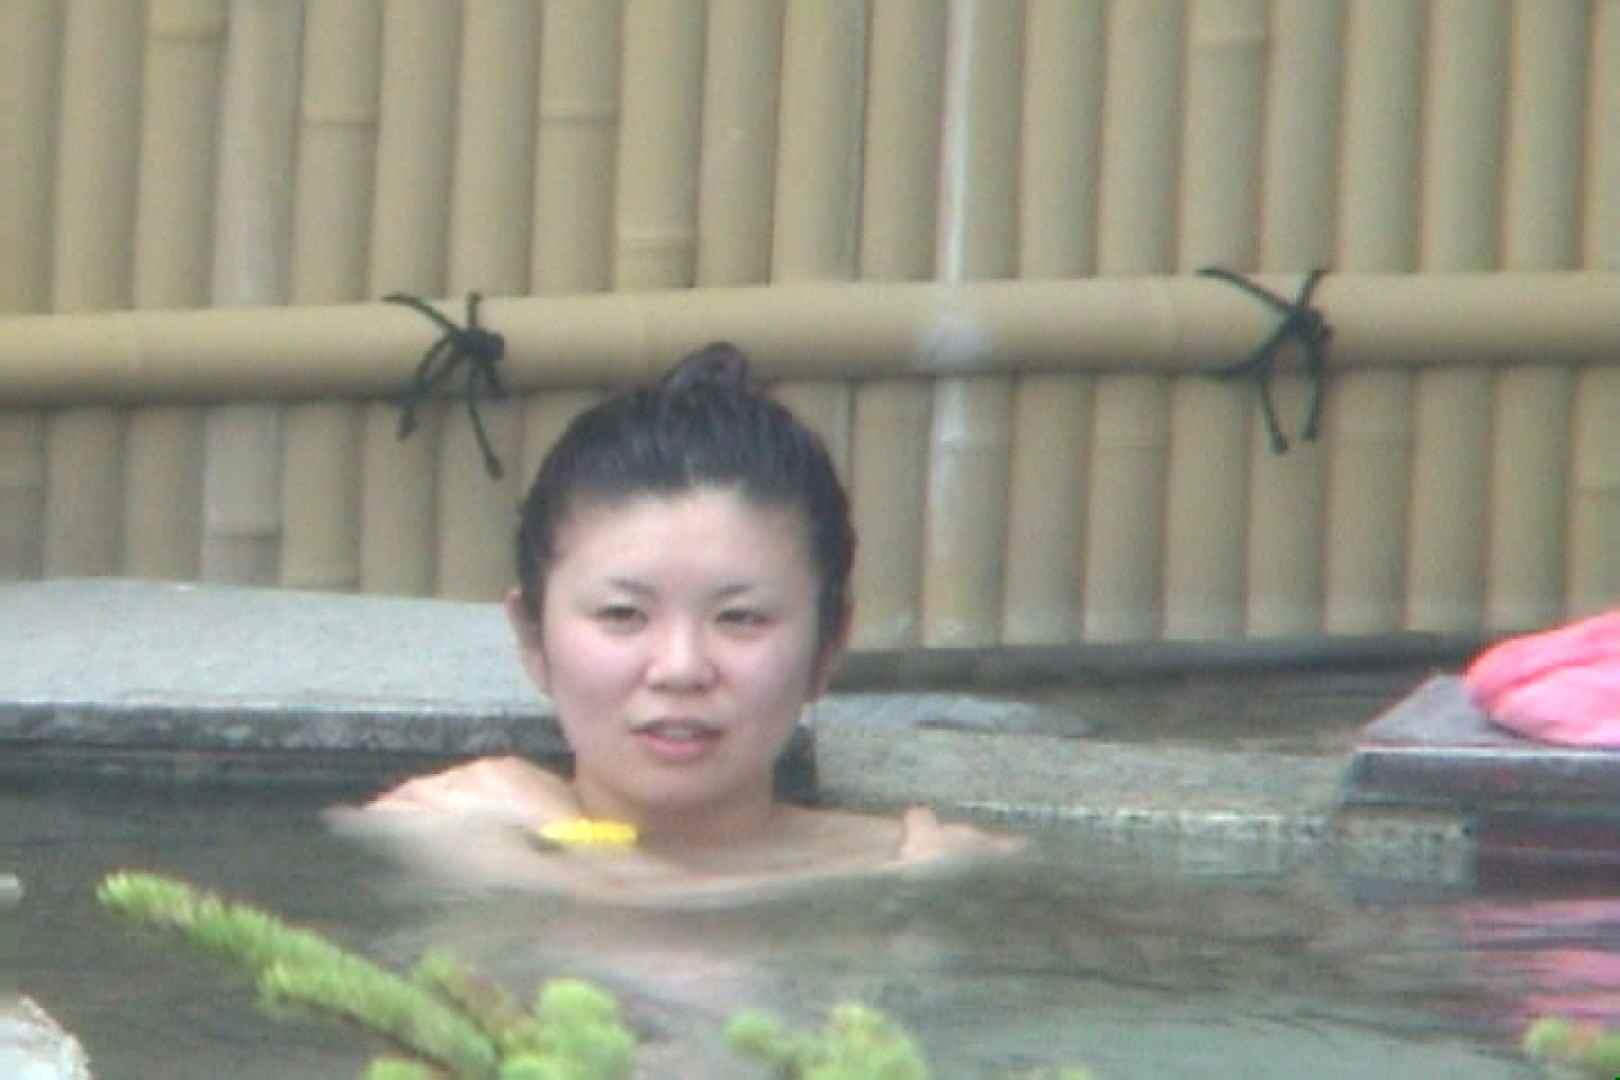 Aquaな露天風呂Vol.47【VIP限定】 女体盗撮 盗み撮りAV無料動画キャプチャ 105連発 2